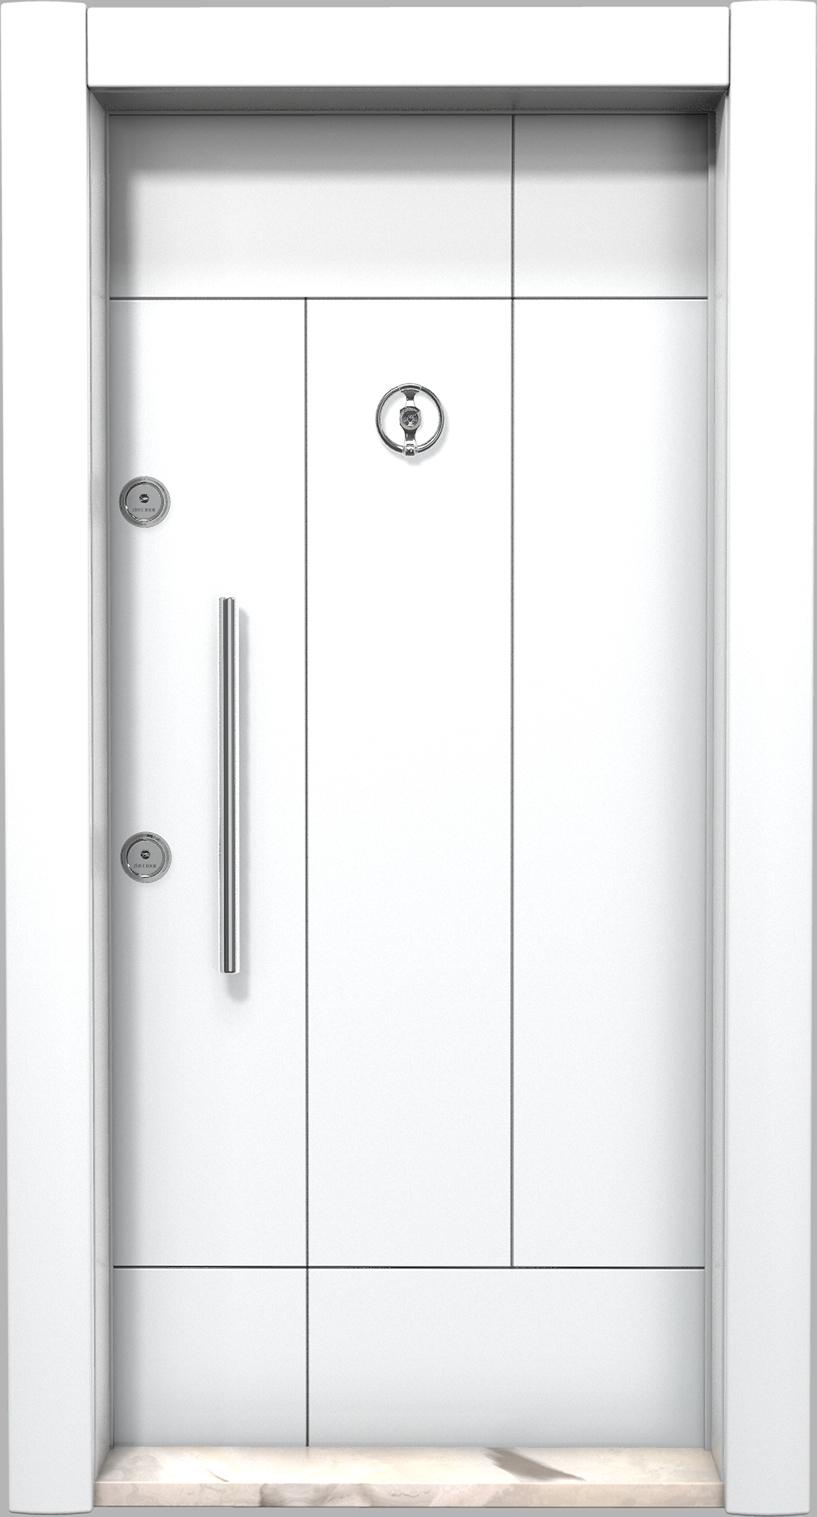 RL4200